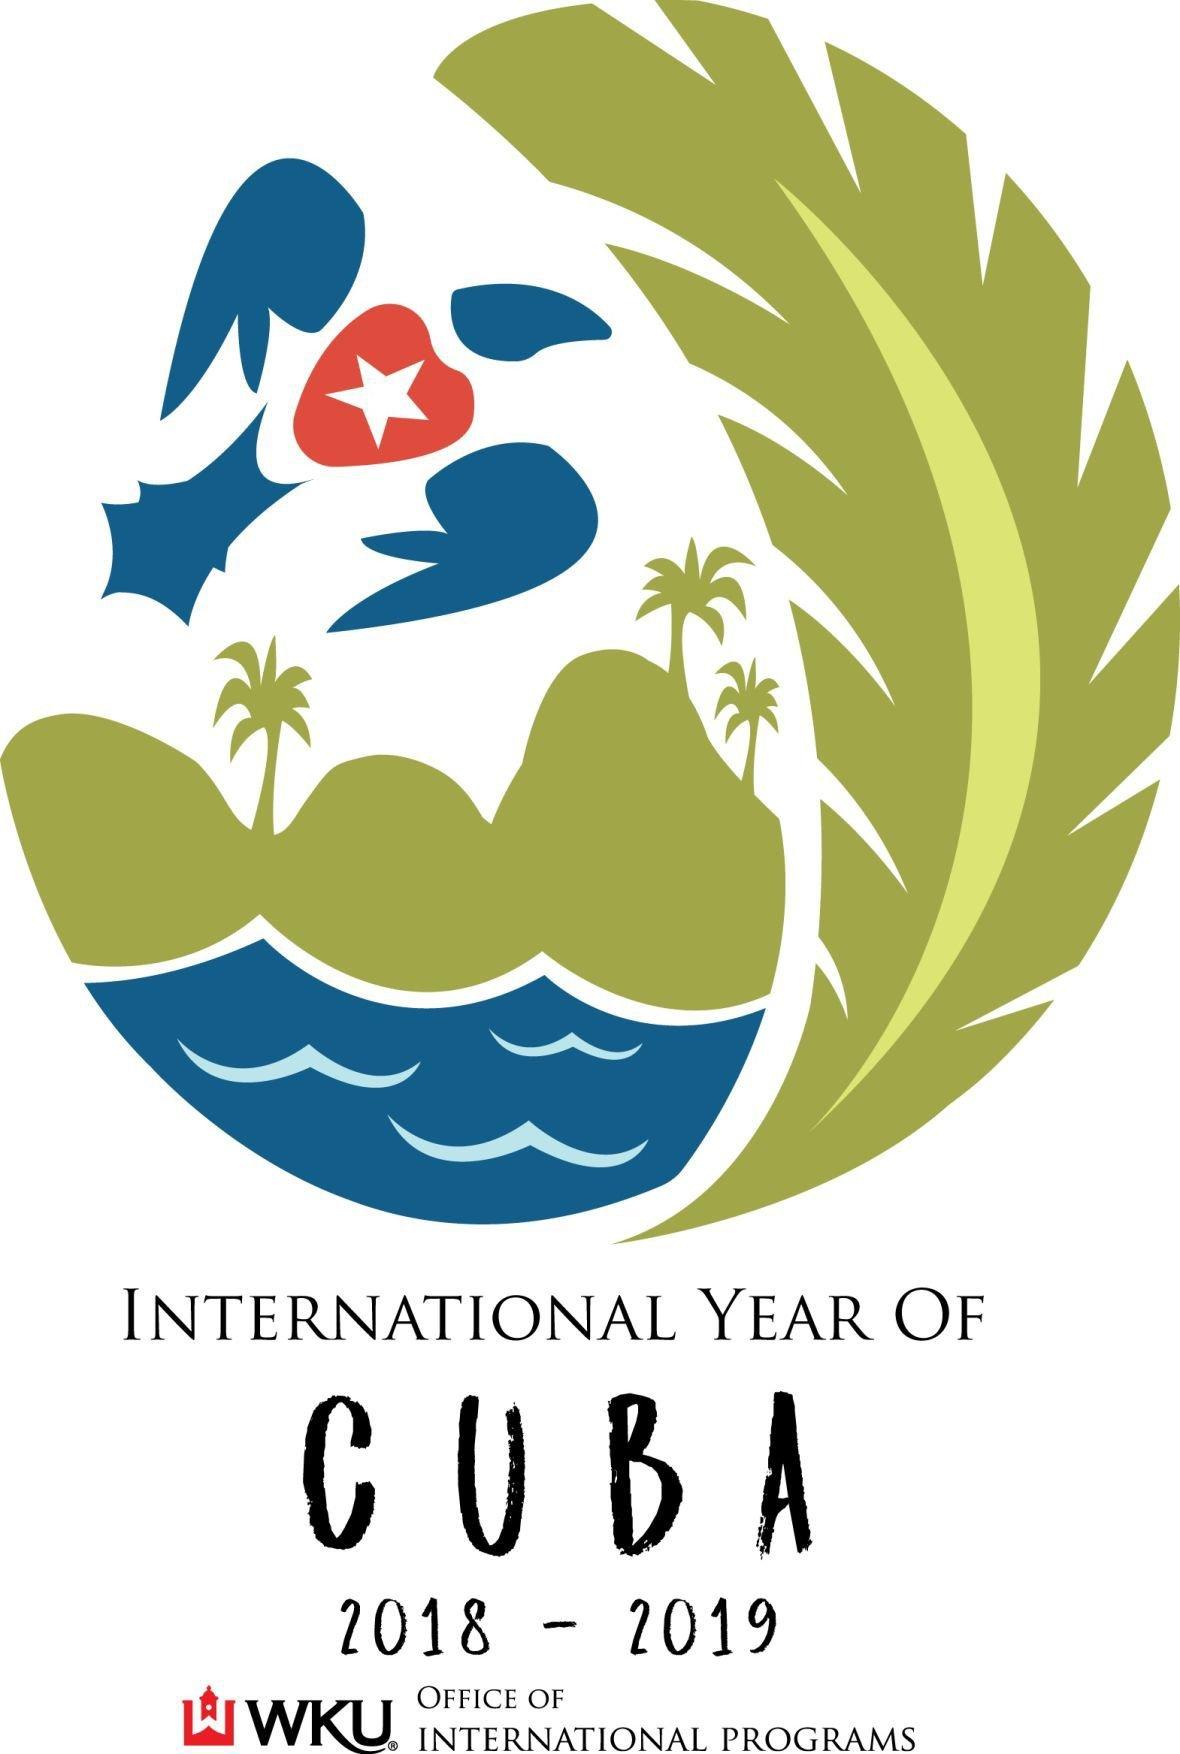 WKU gears up for International Year of Cuba